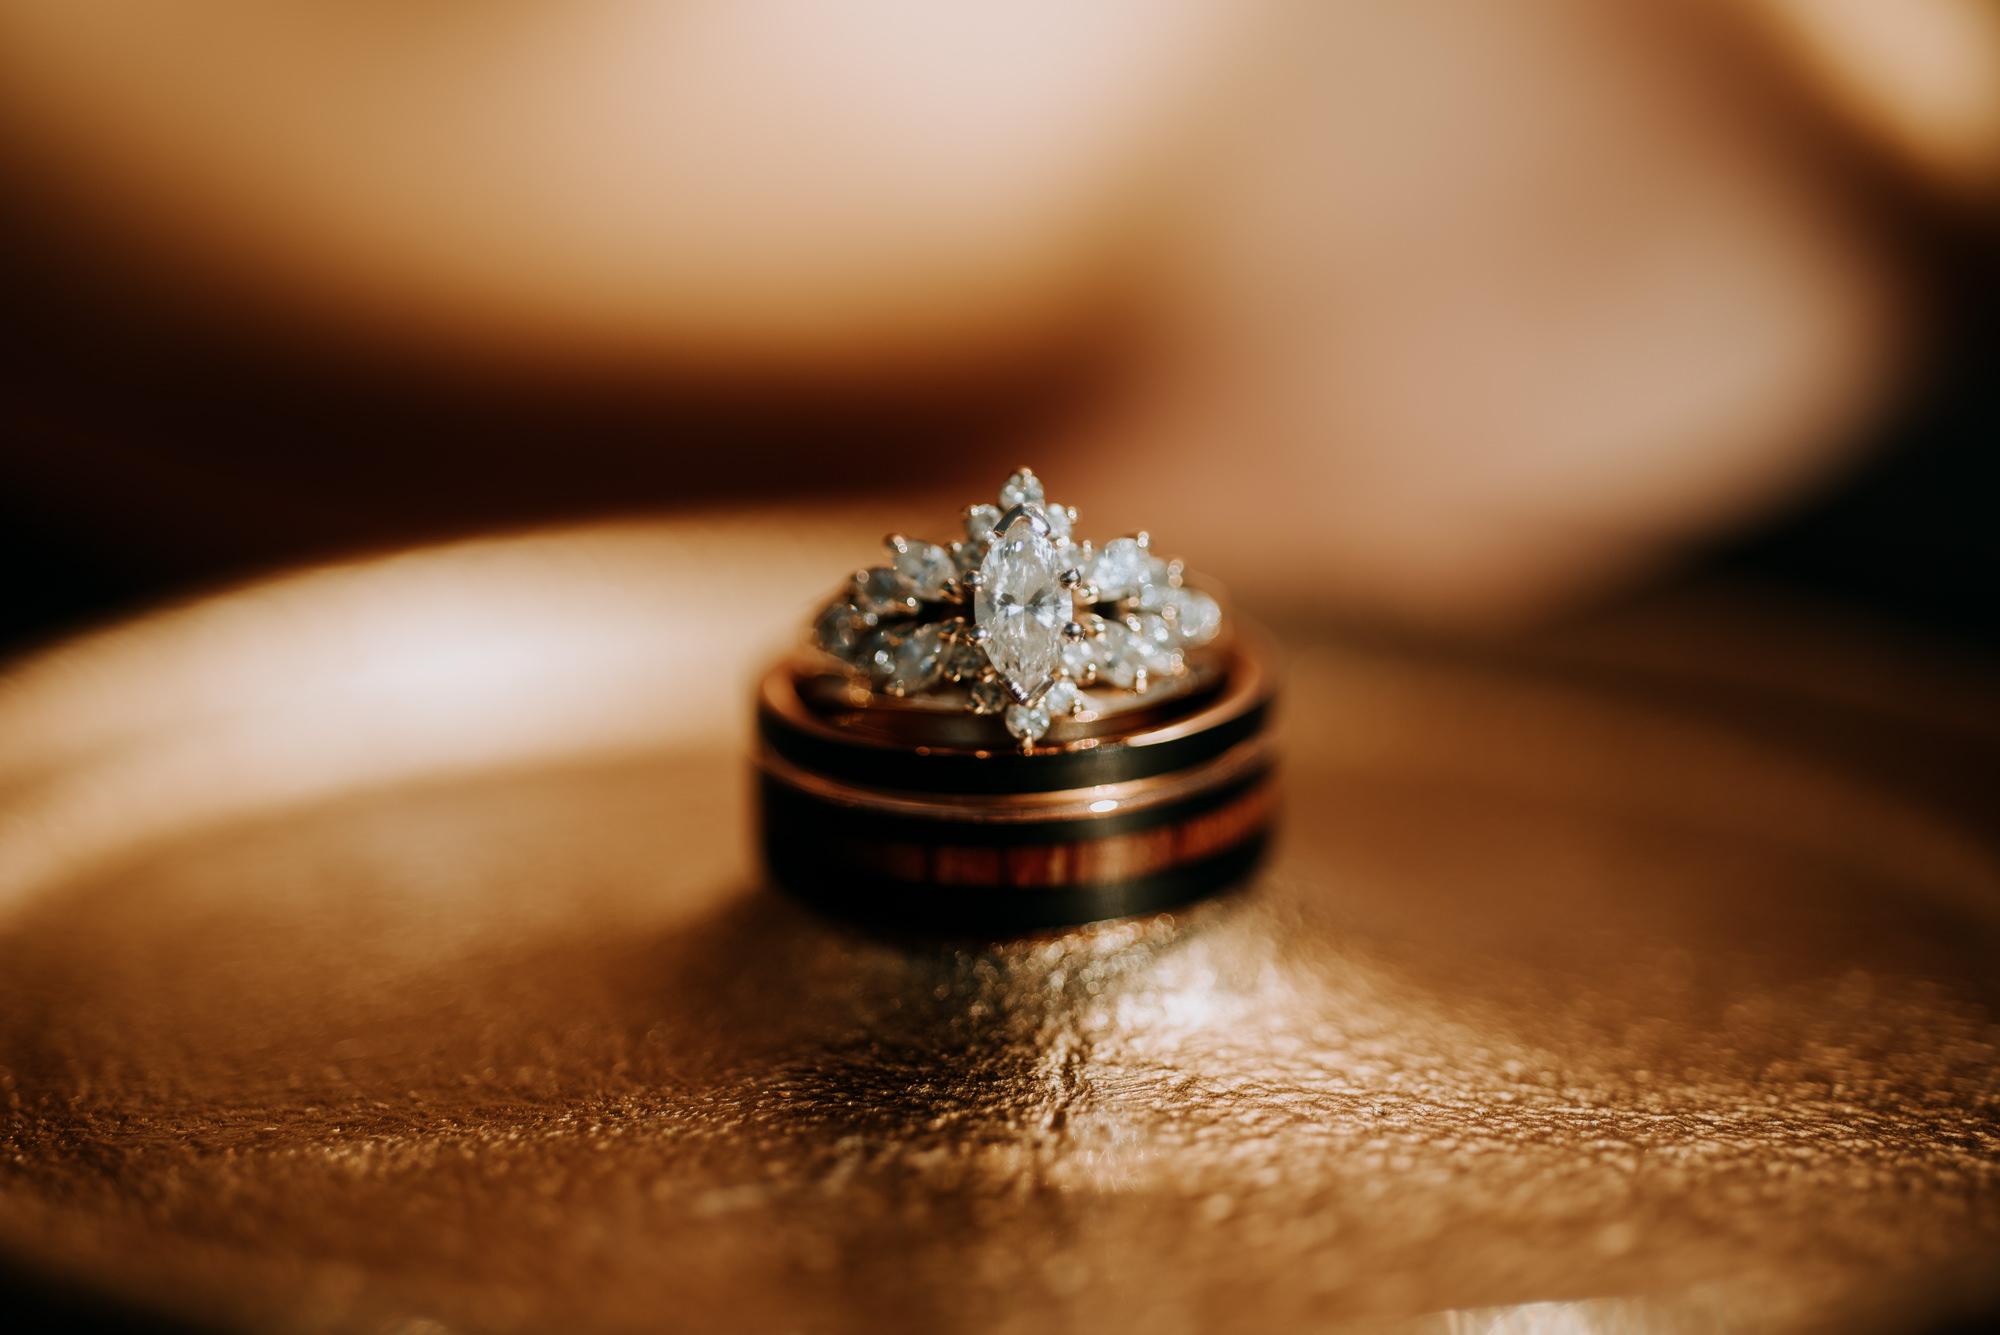 A rose gold and diamond wedding band detail shot.